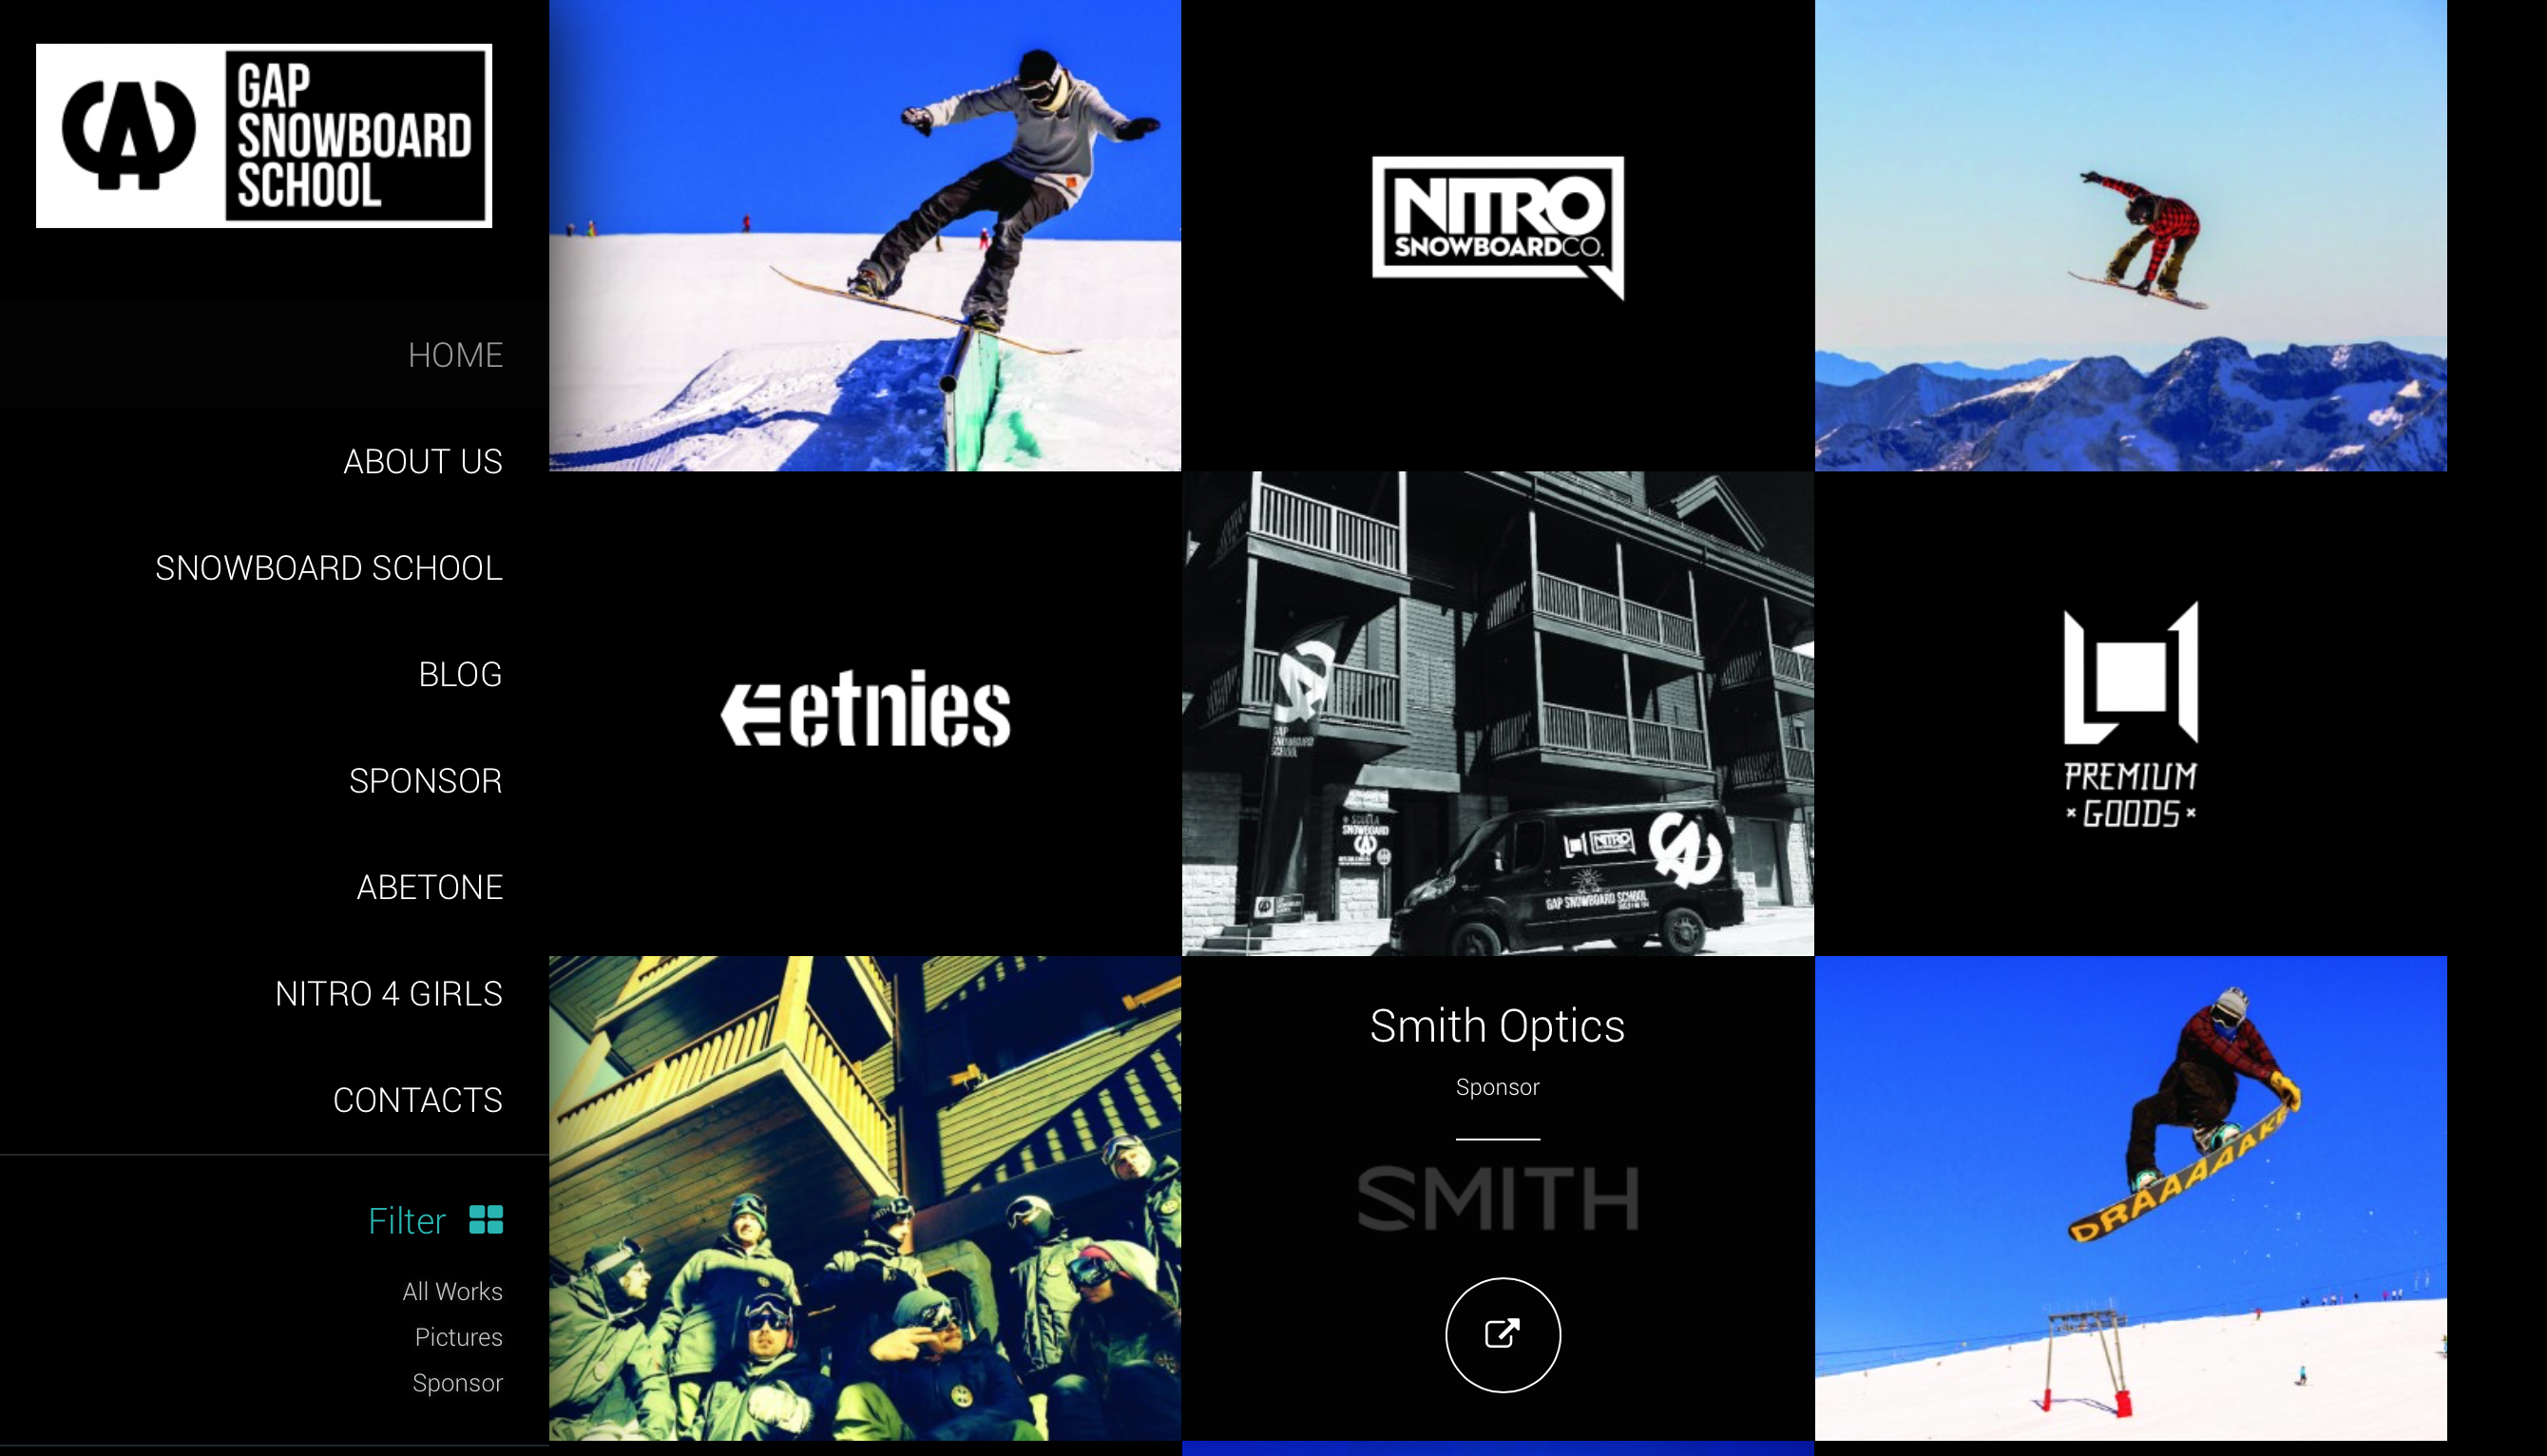 gap snowboard abetone